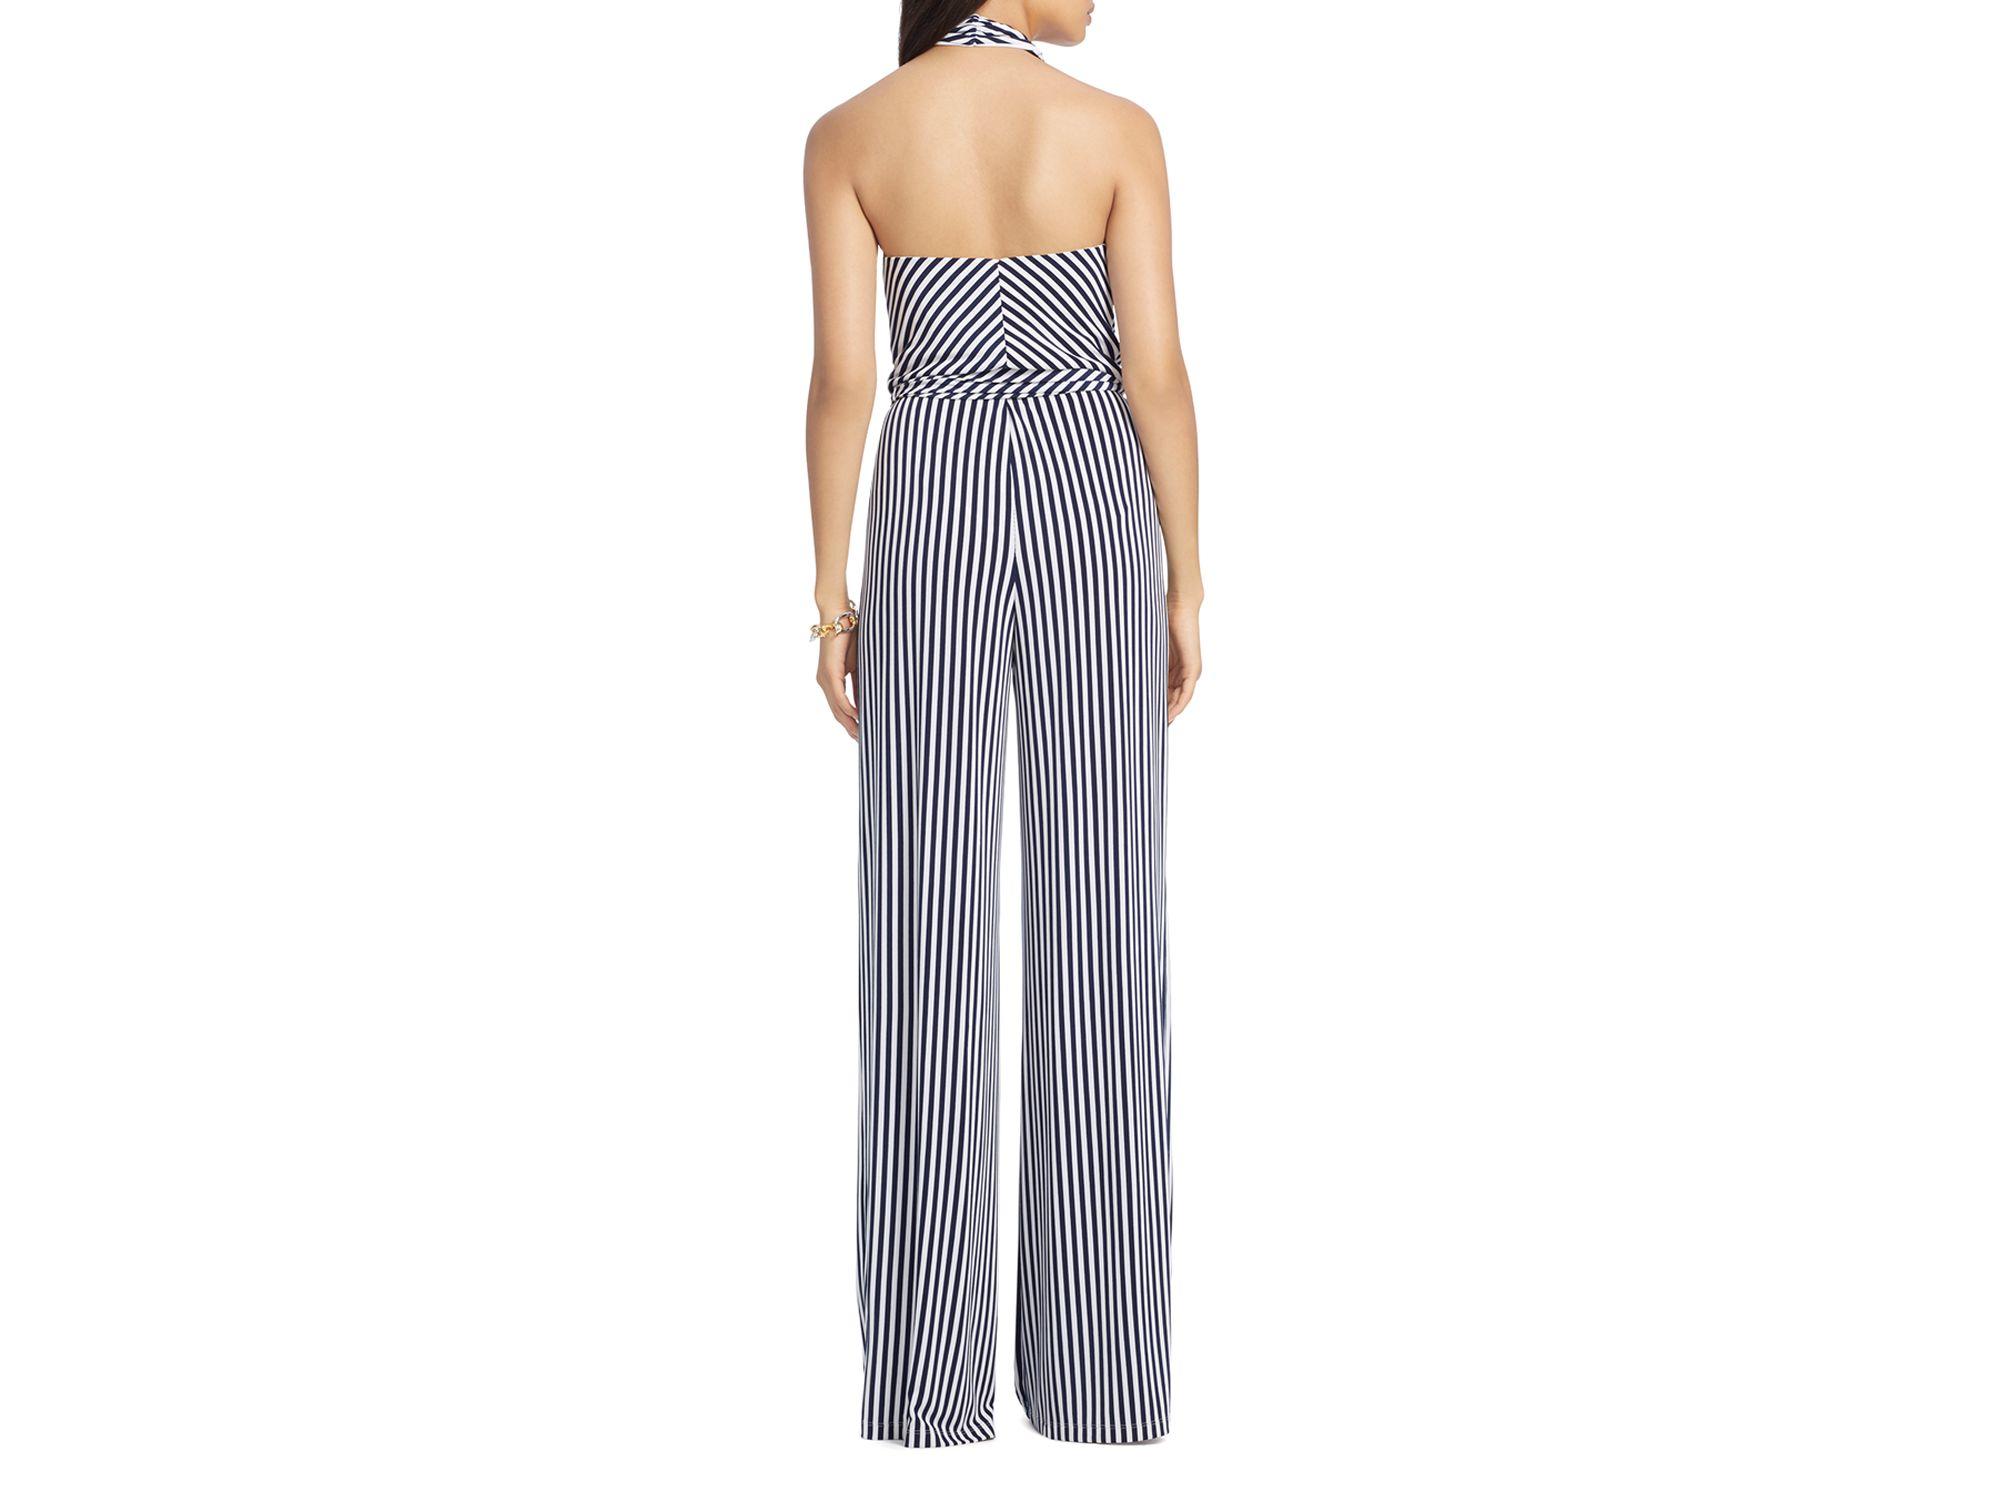 10b2d9bedd18 Lyst - Ralph Lauren Lauren Striped Jumpsuit in Blue